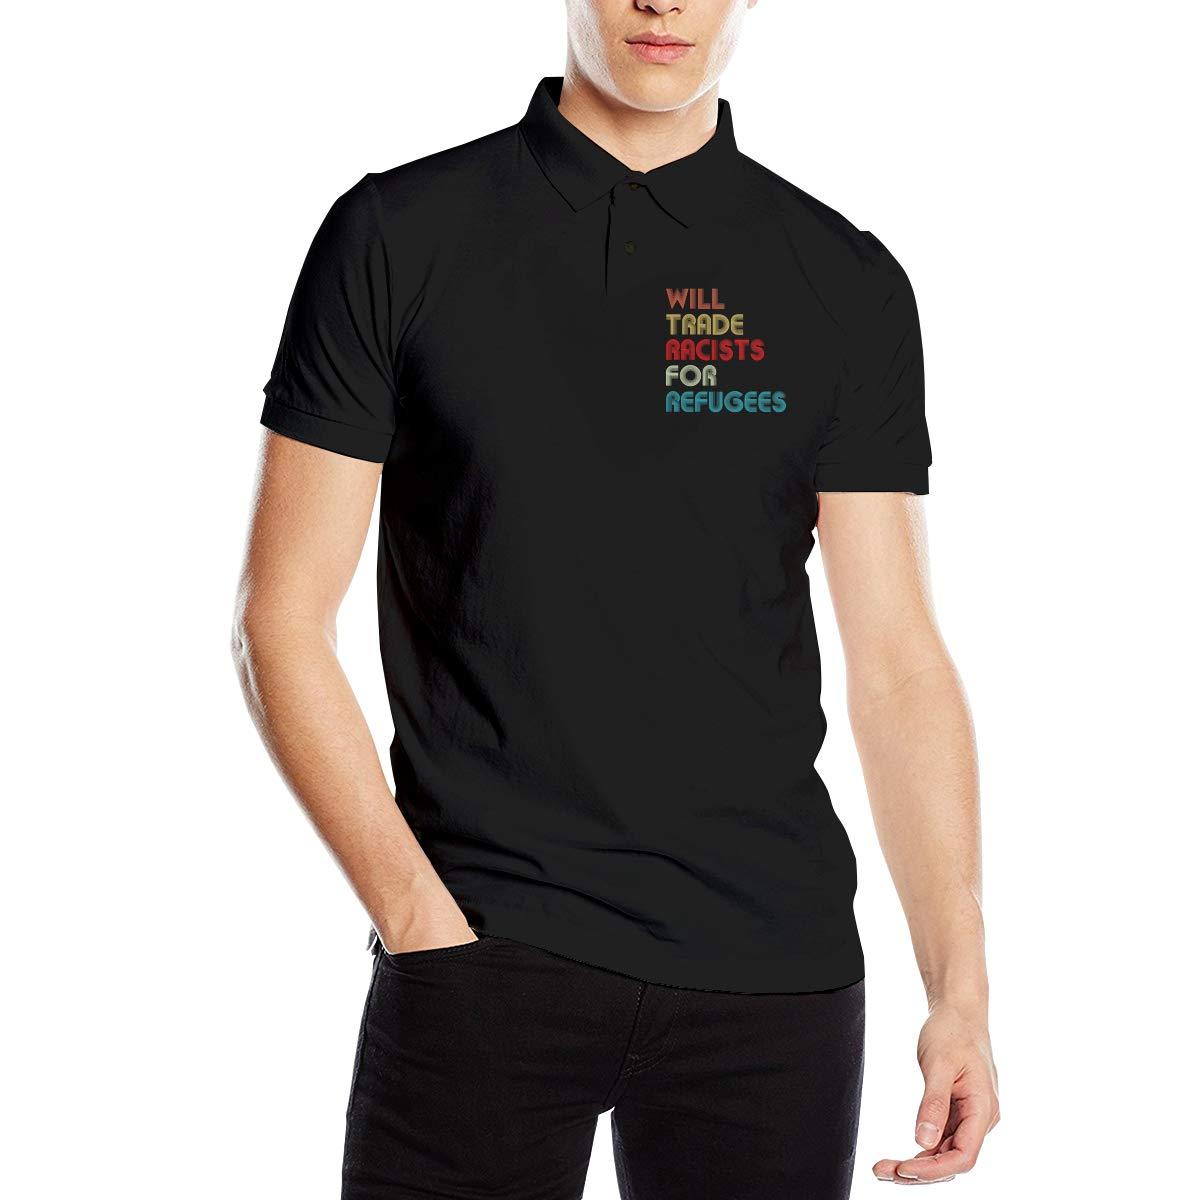 Cjlrqone Will Refugees Men Funny Polo Shirts L Black